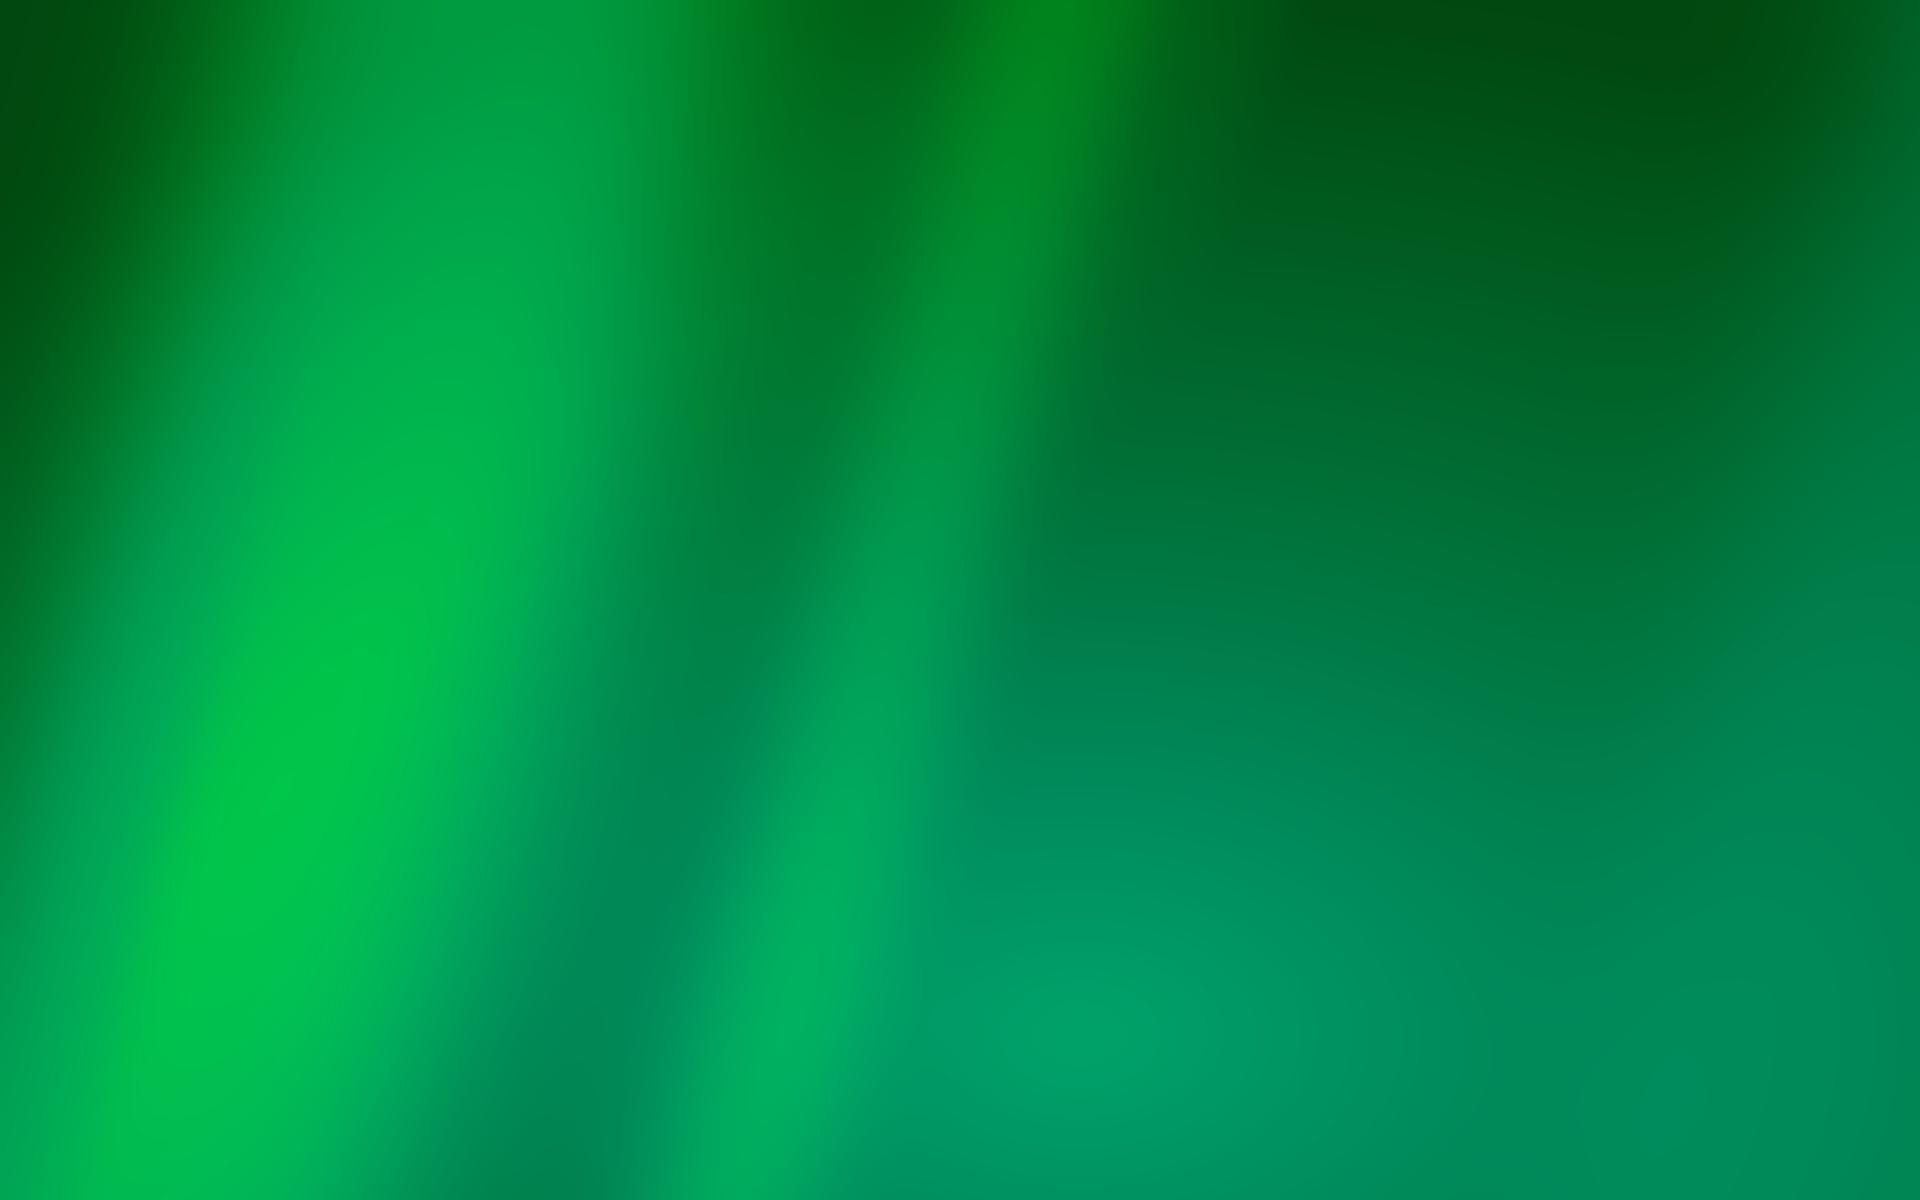 Res: 1920x1200, default-wallpaper-abstract.png (PNG Image, 1920 x 1200 pixels)